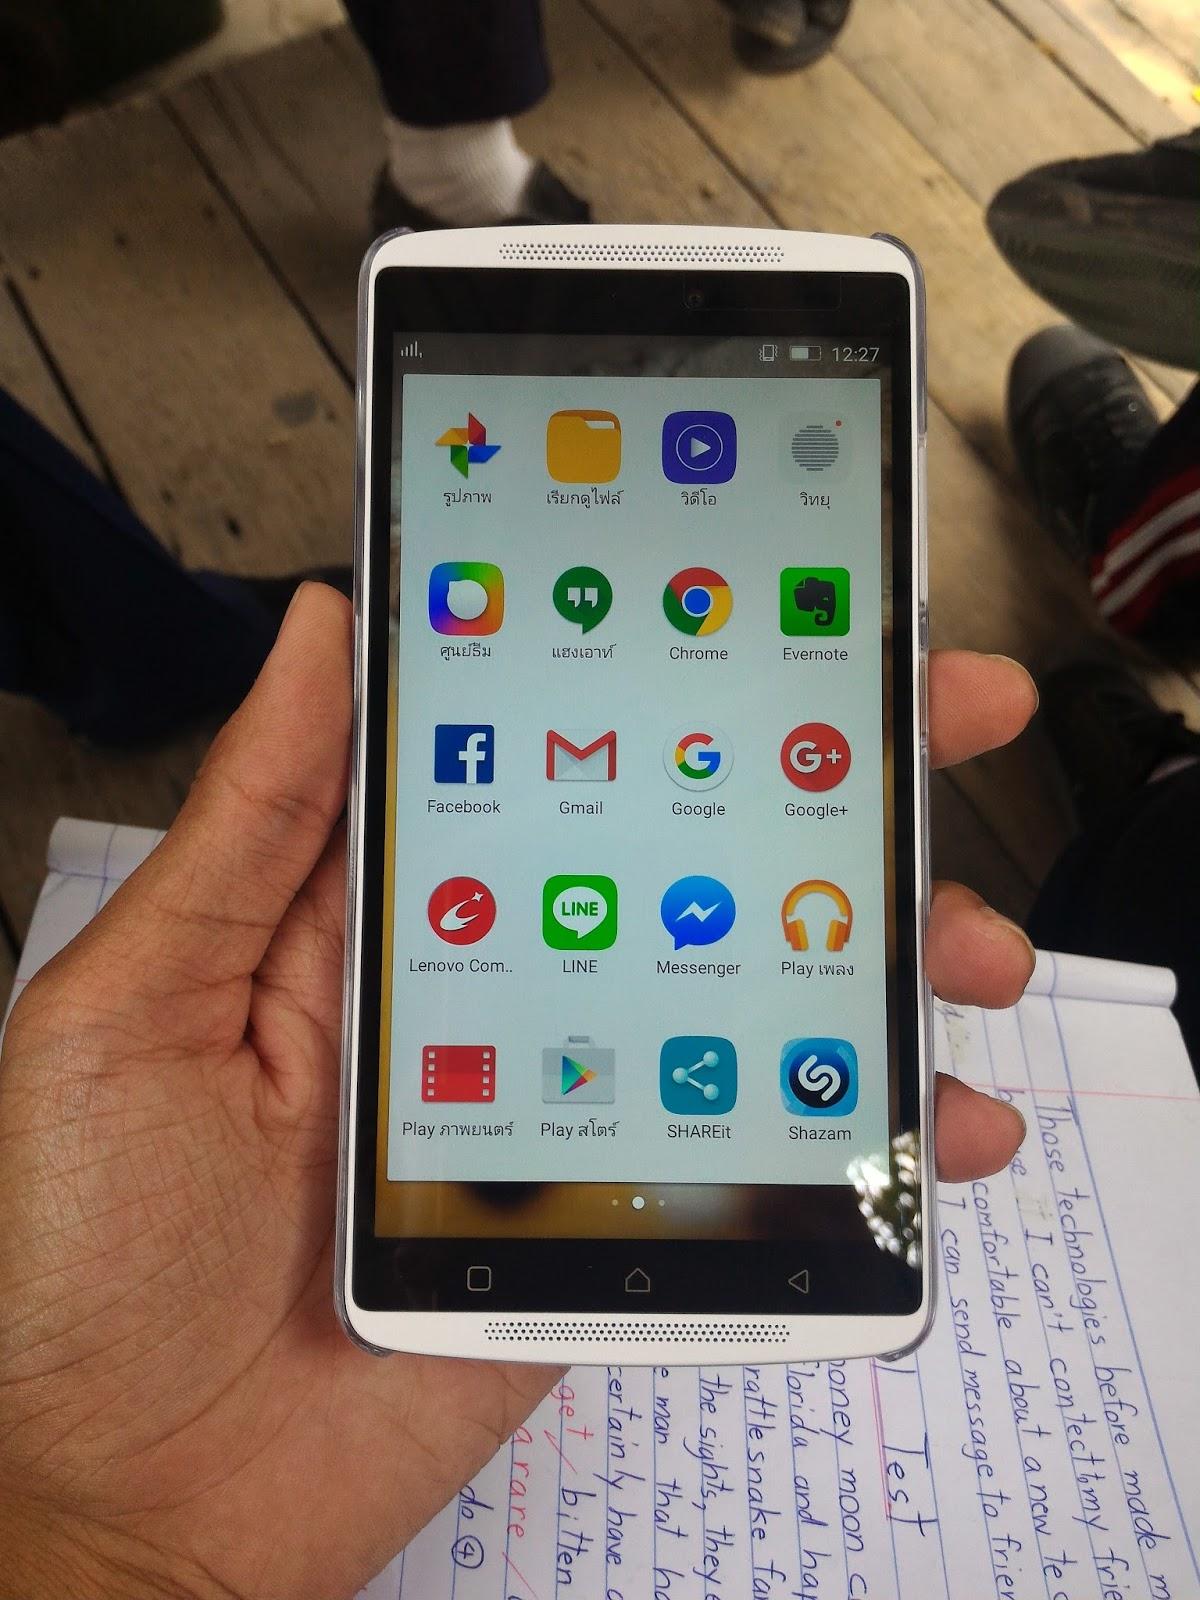 Lenovo K4 Note ภรือ Vibe K4 Note สมาร์ทโฟนรุ่นล่าสุดที่เพิ่งนำมาขายที่ไทยพร้อมกับ Lenovo Vibe X3 ในงาน Thailand Mobile Expo 2016 สานต่อความสำเร็จจาก Lenovo